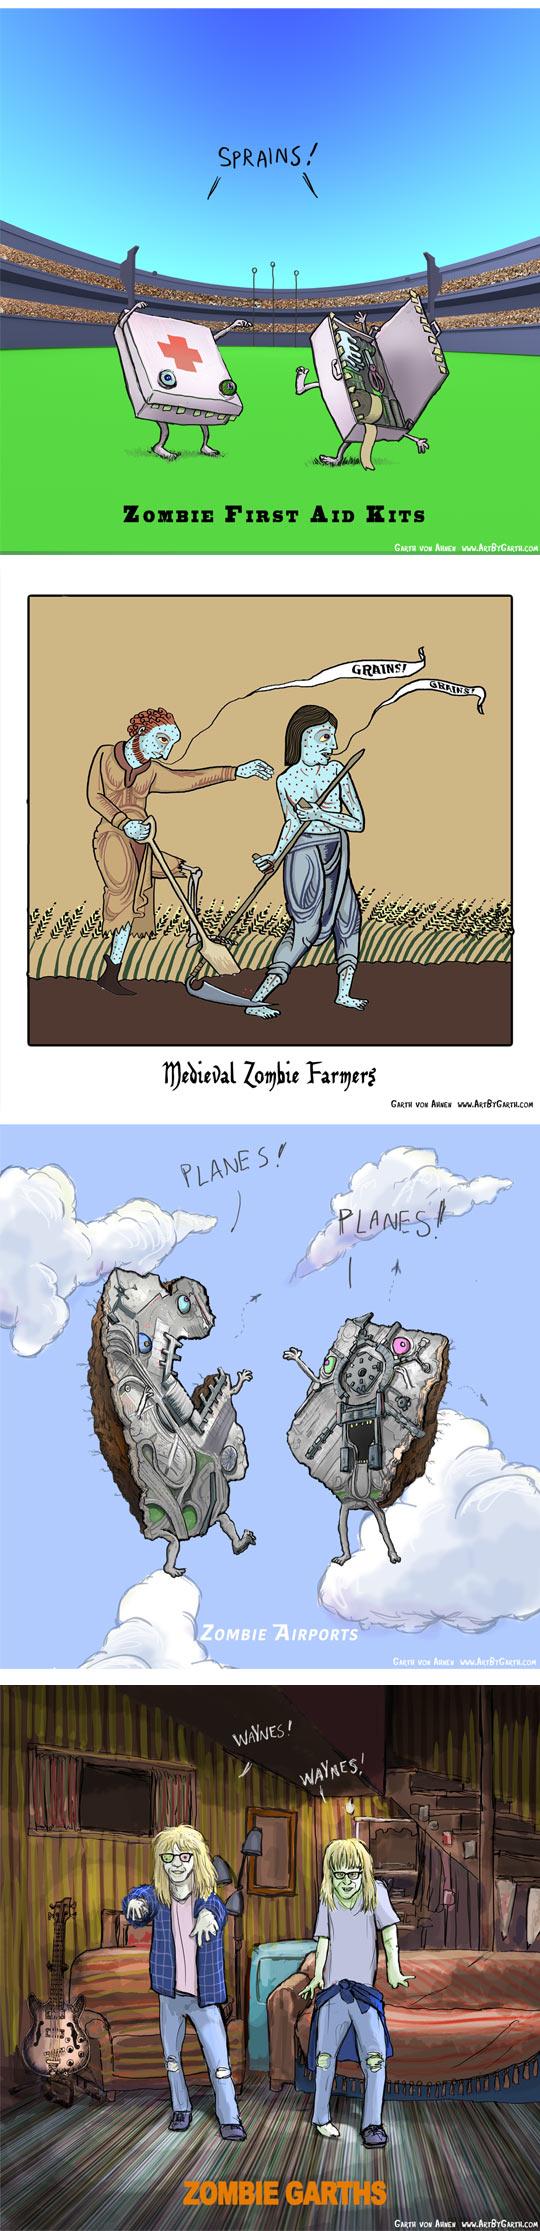 funny-zombie-pun-tunnels-train-Wayne